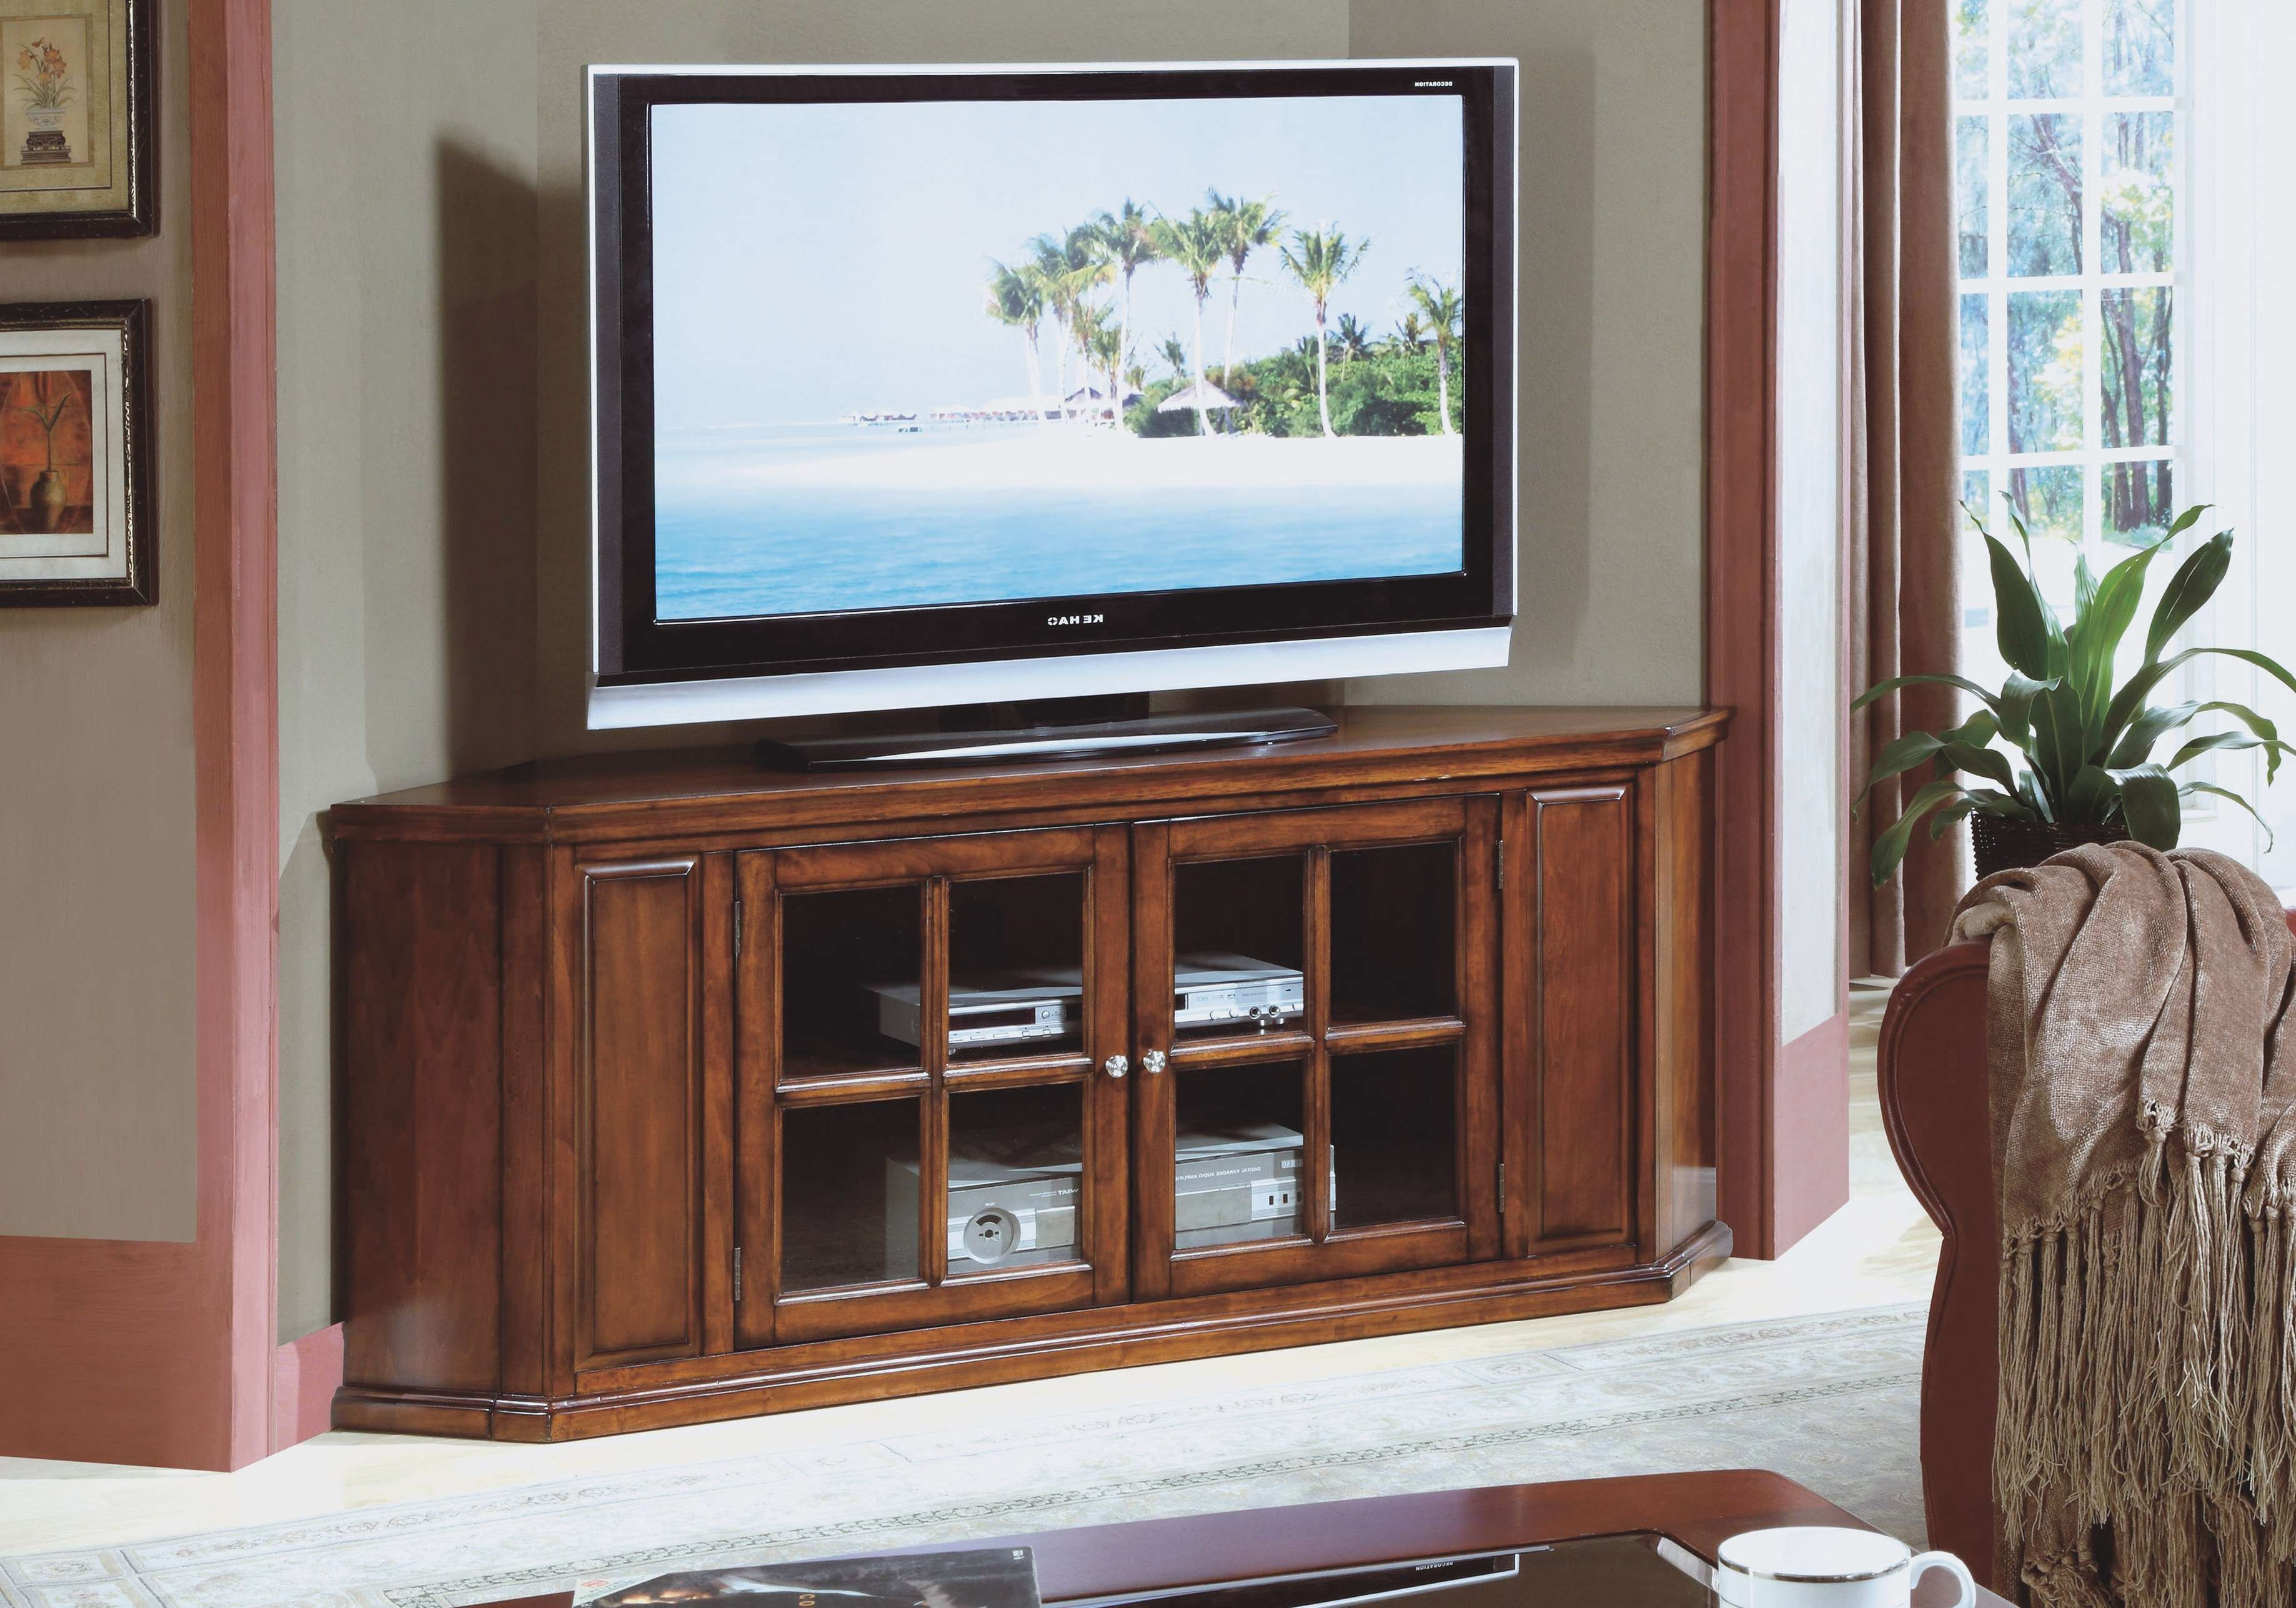 Oak Tv Cabinet With Doors Gallery – Doors Design Ideas Inside Oak Tv Cabinets For Flat Screens With Doors (View 8 of 20)